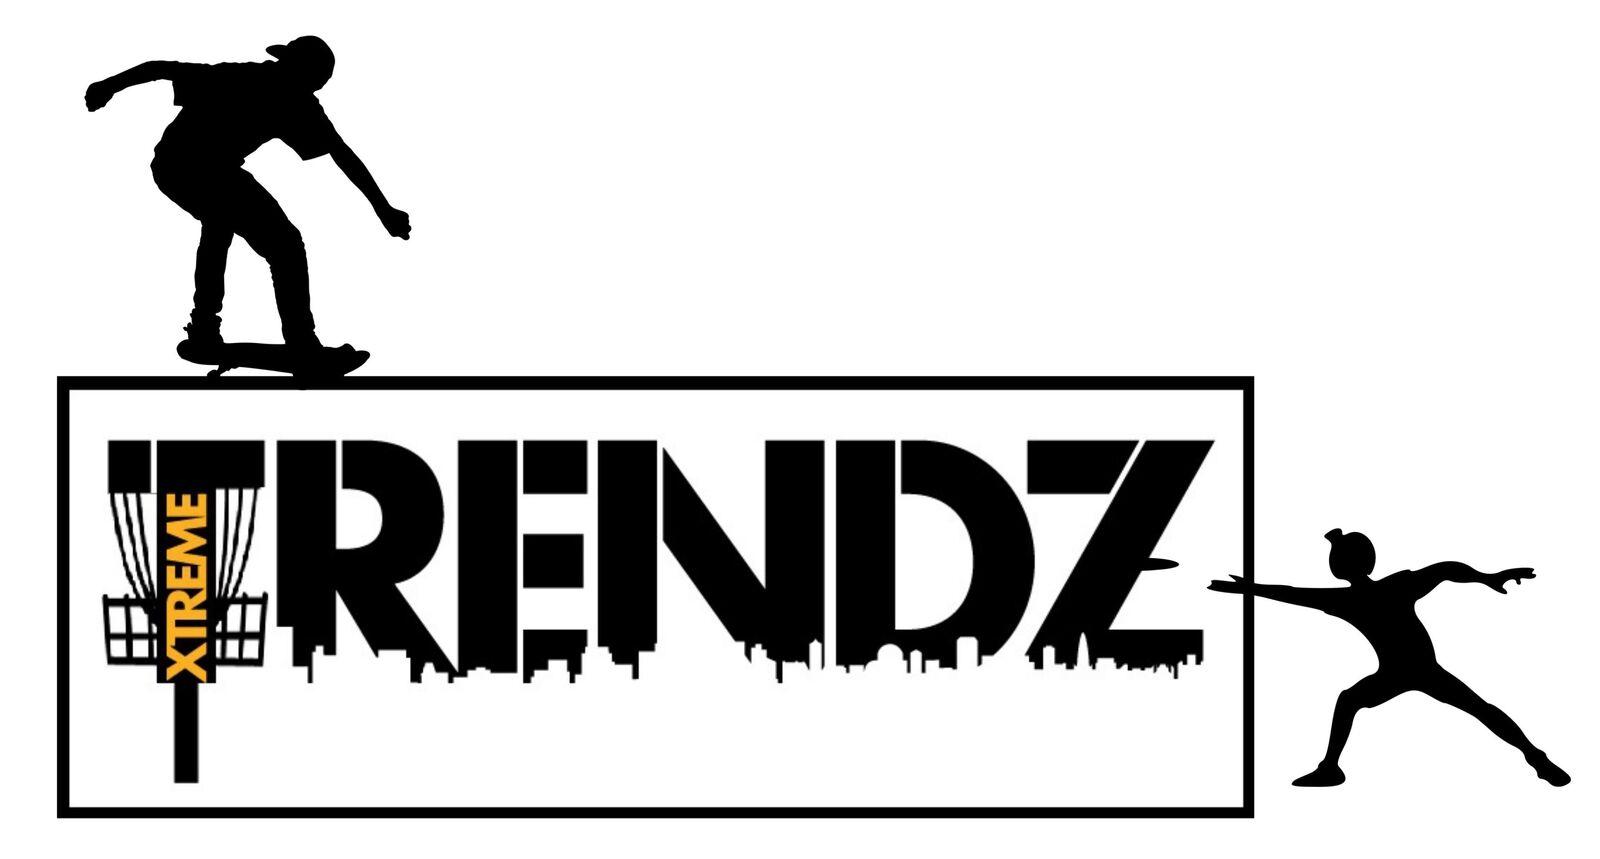 XTREME TRENDZ